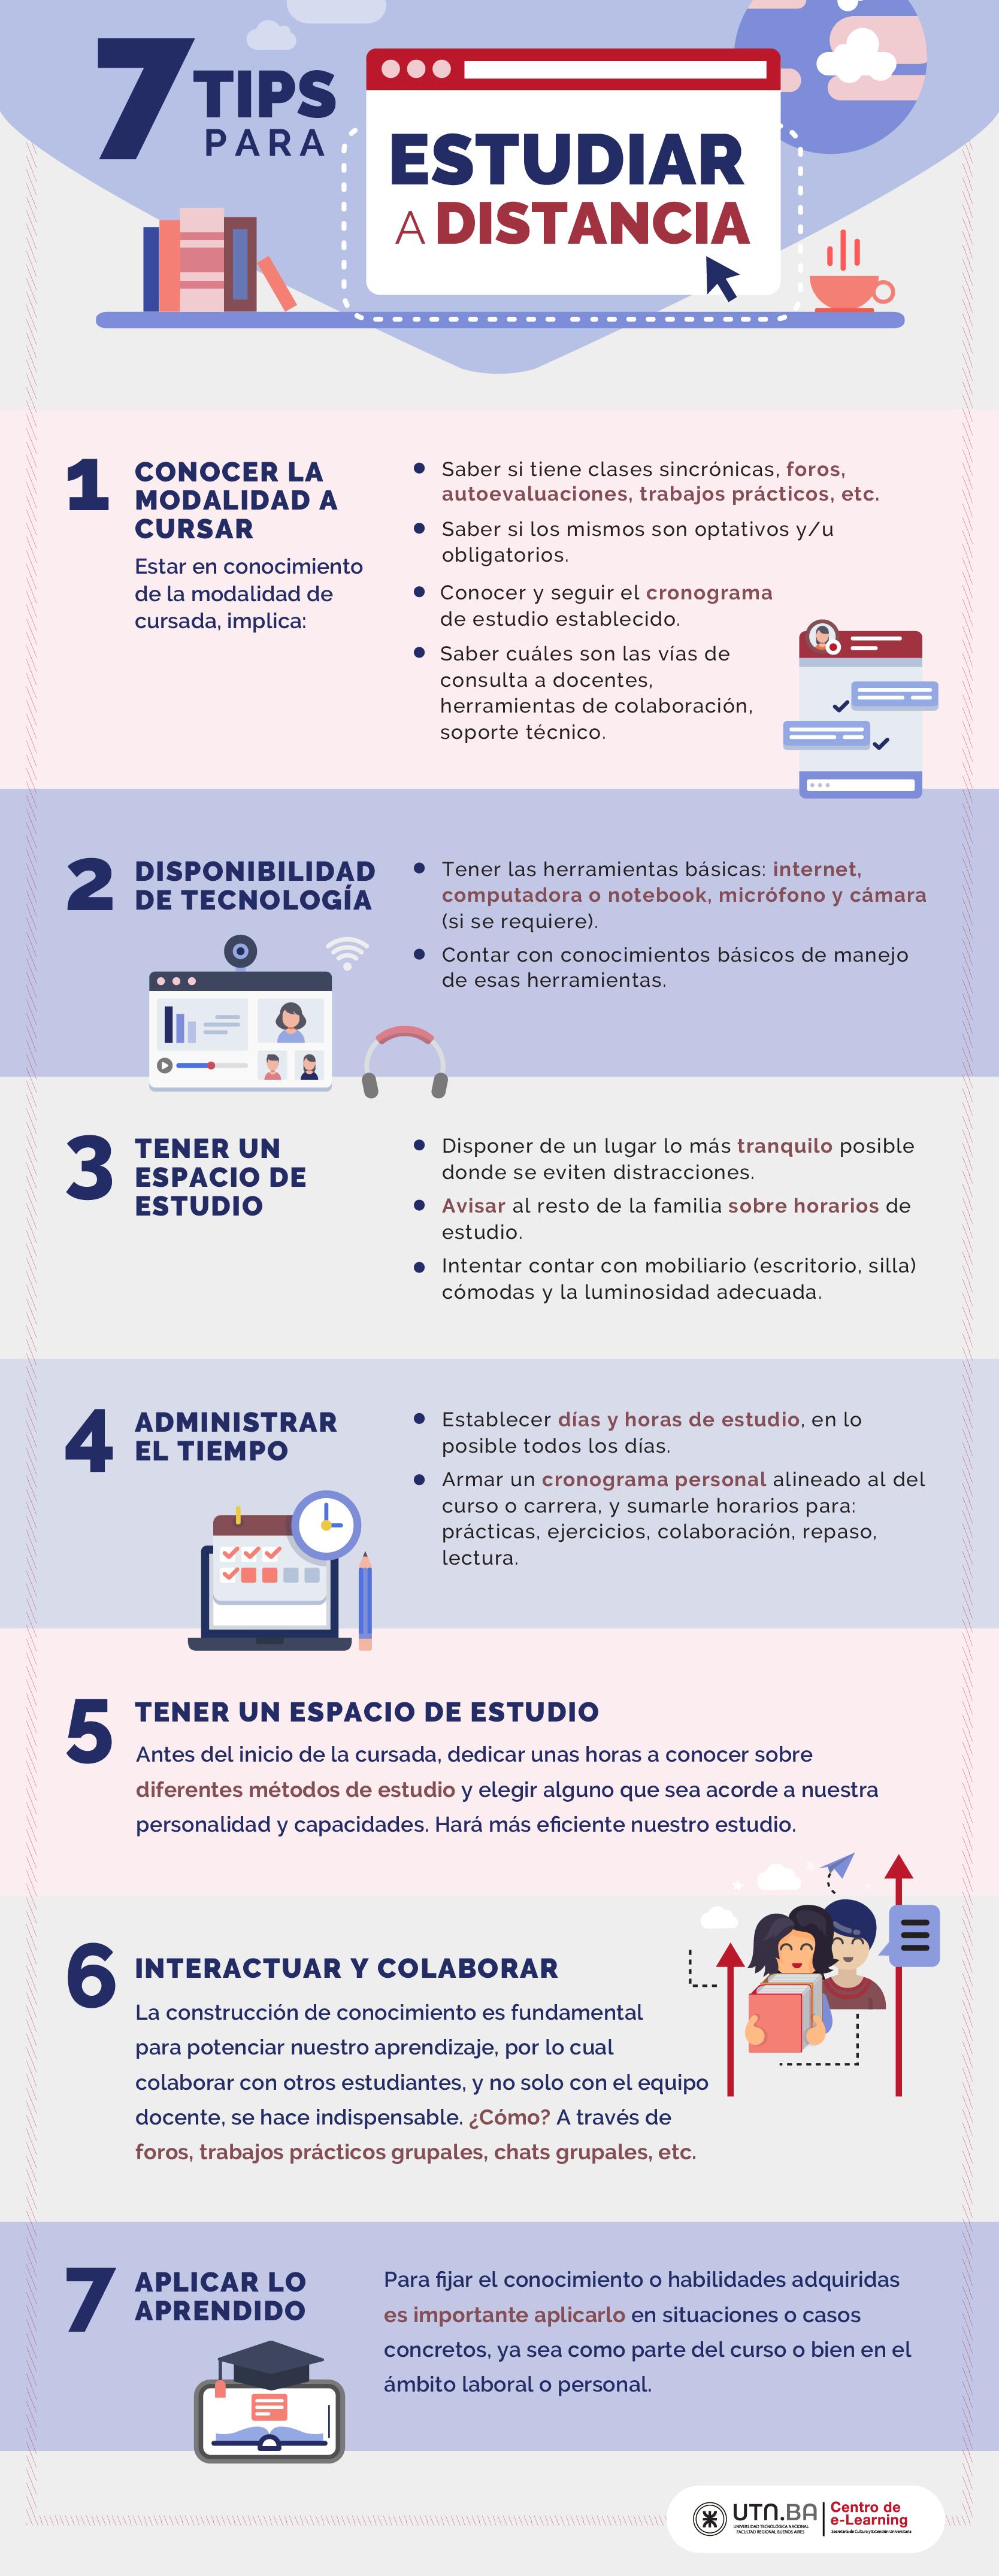 infografia 7 TIPS PARA ESTUDIAR ONLINE grande 3